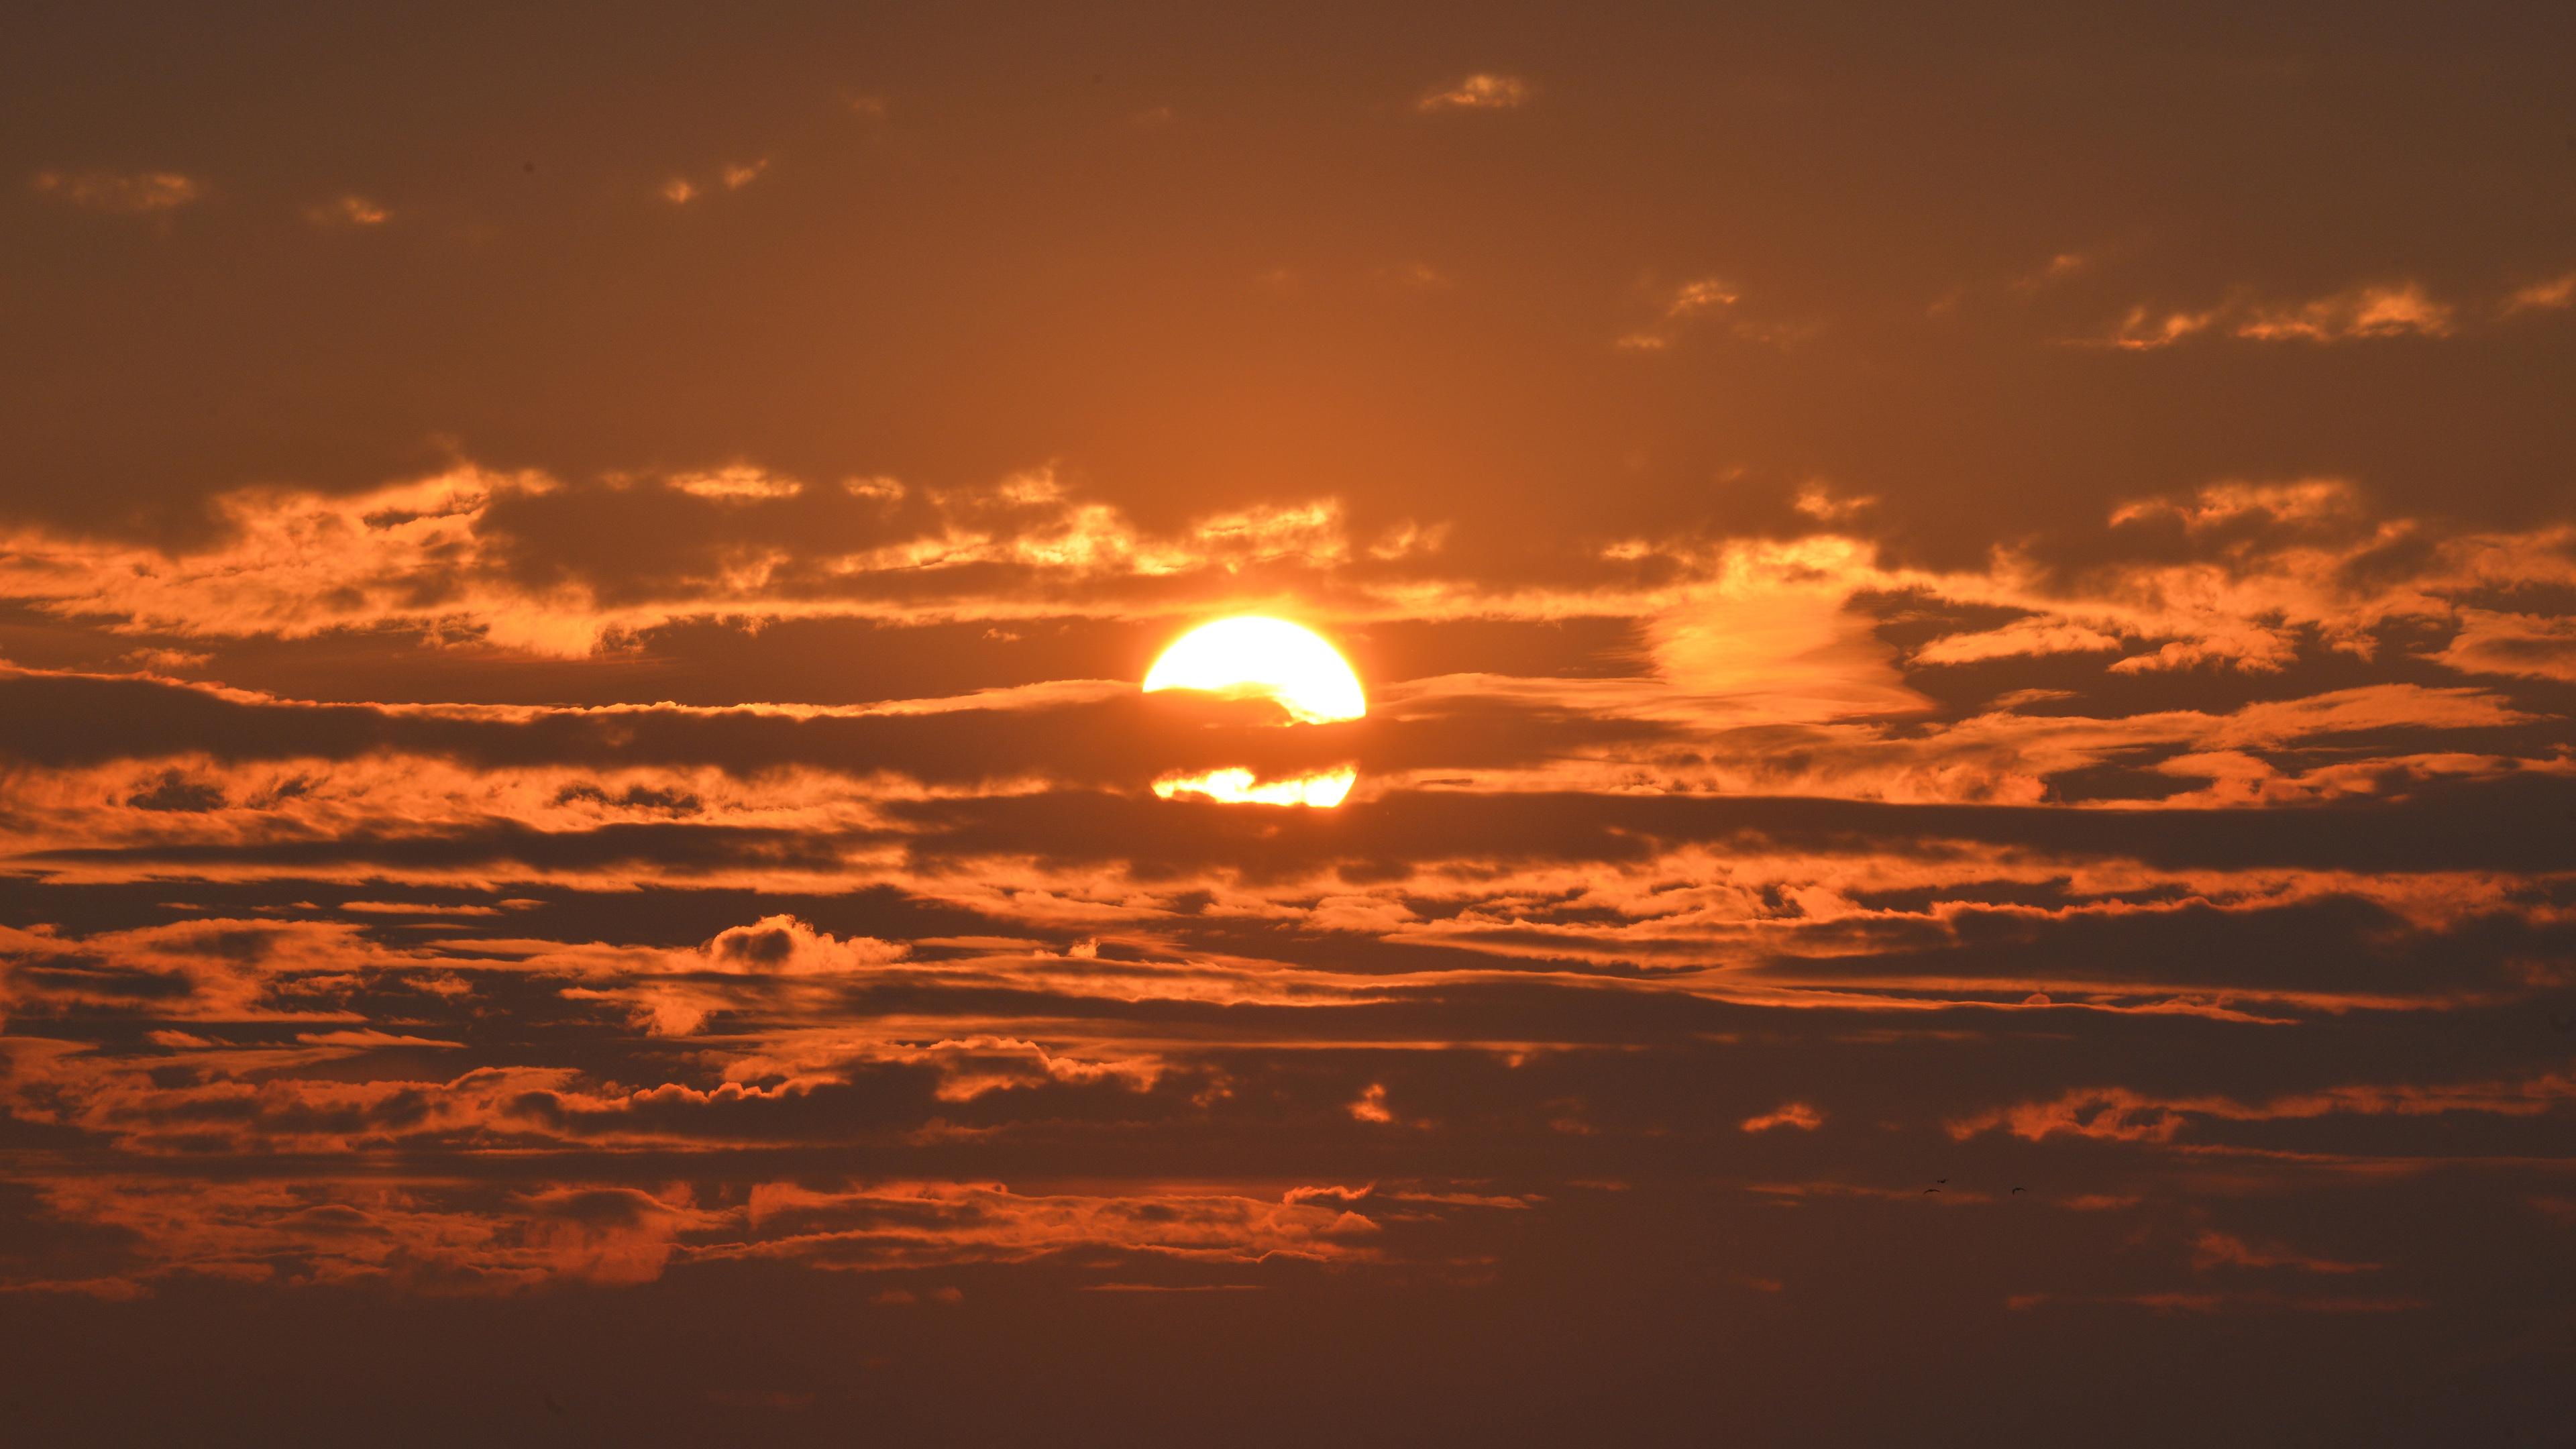 sunset under clouds 4k 1540136427 - Sunset Under Clouds 4k - sunset wallpapers, nature wallpapers, hd-wallpapers, clouds wallpapers, 8k wallpapers, 5k wallpapers, 4k-wallpapers